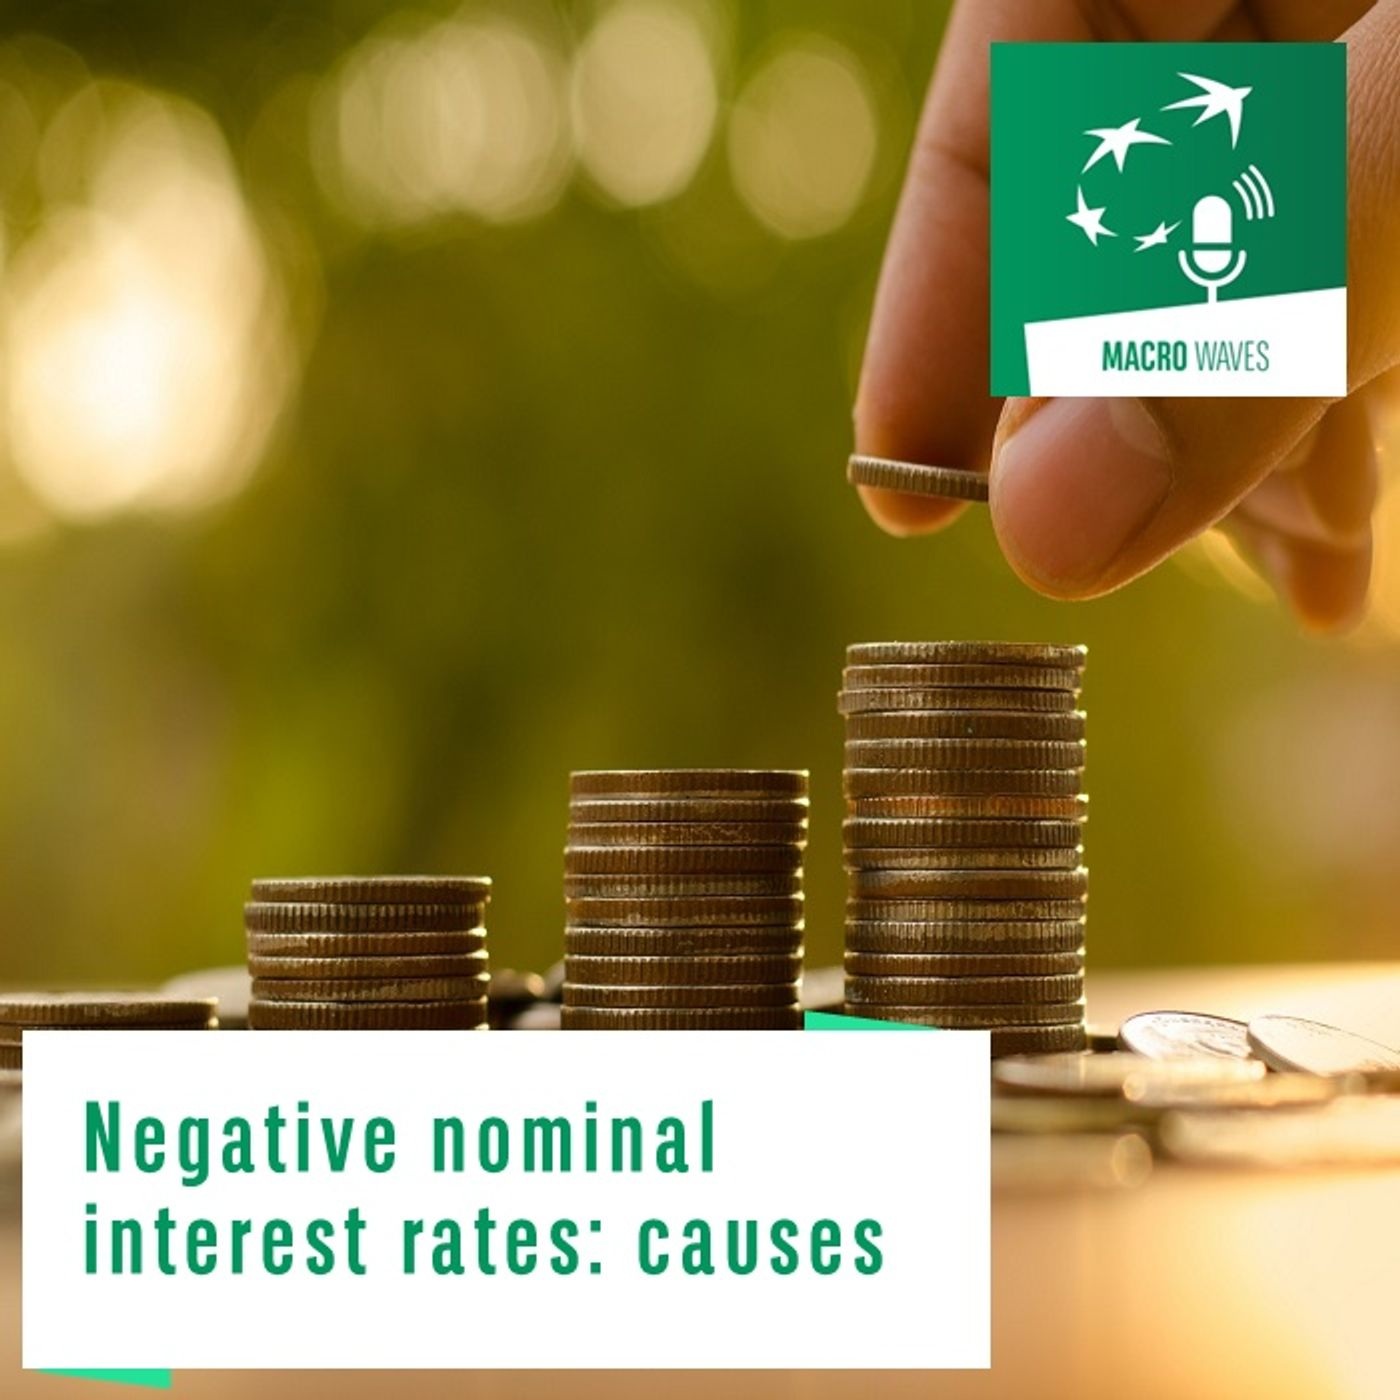 #01 – Negative nominal interest rates: causes